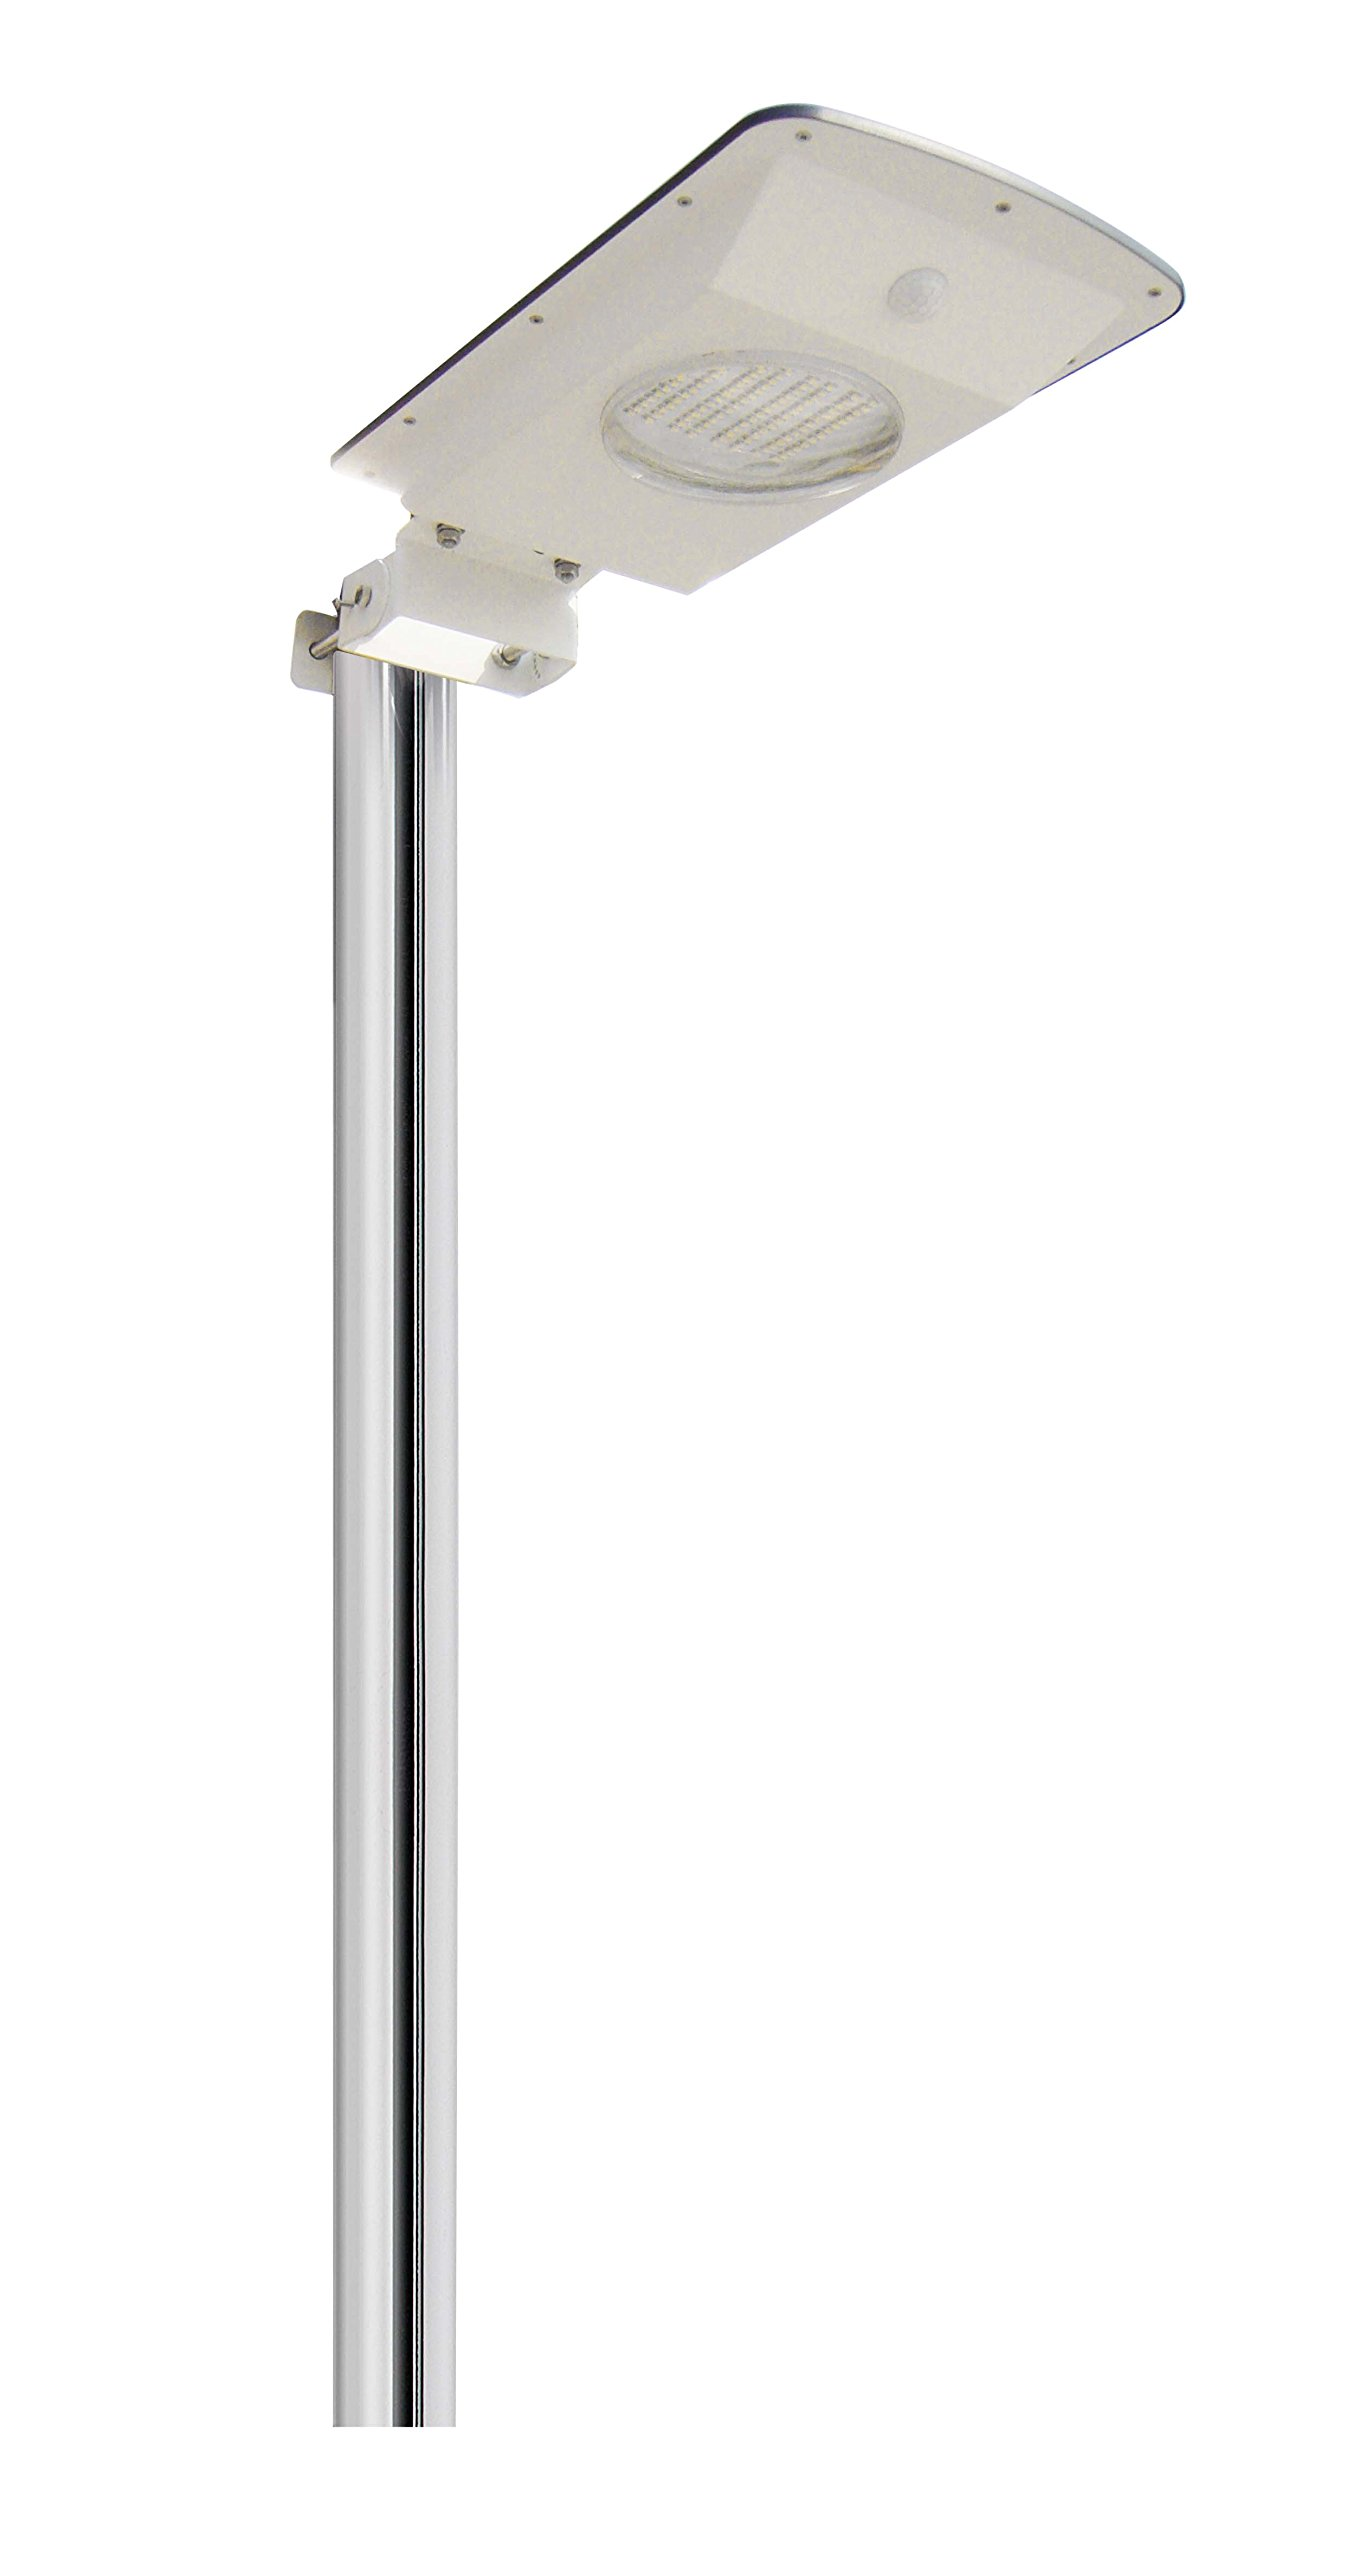 112 LED 8W Solar Security Light